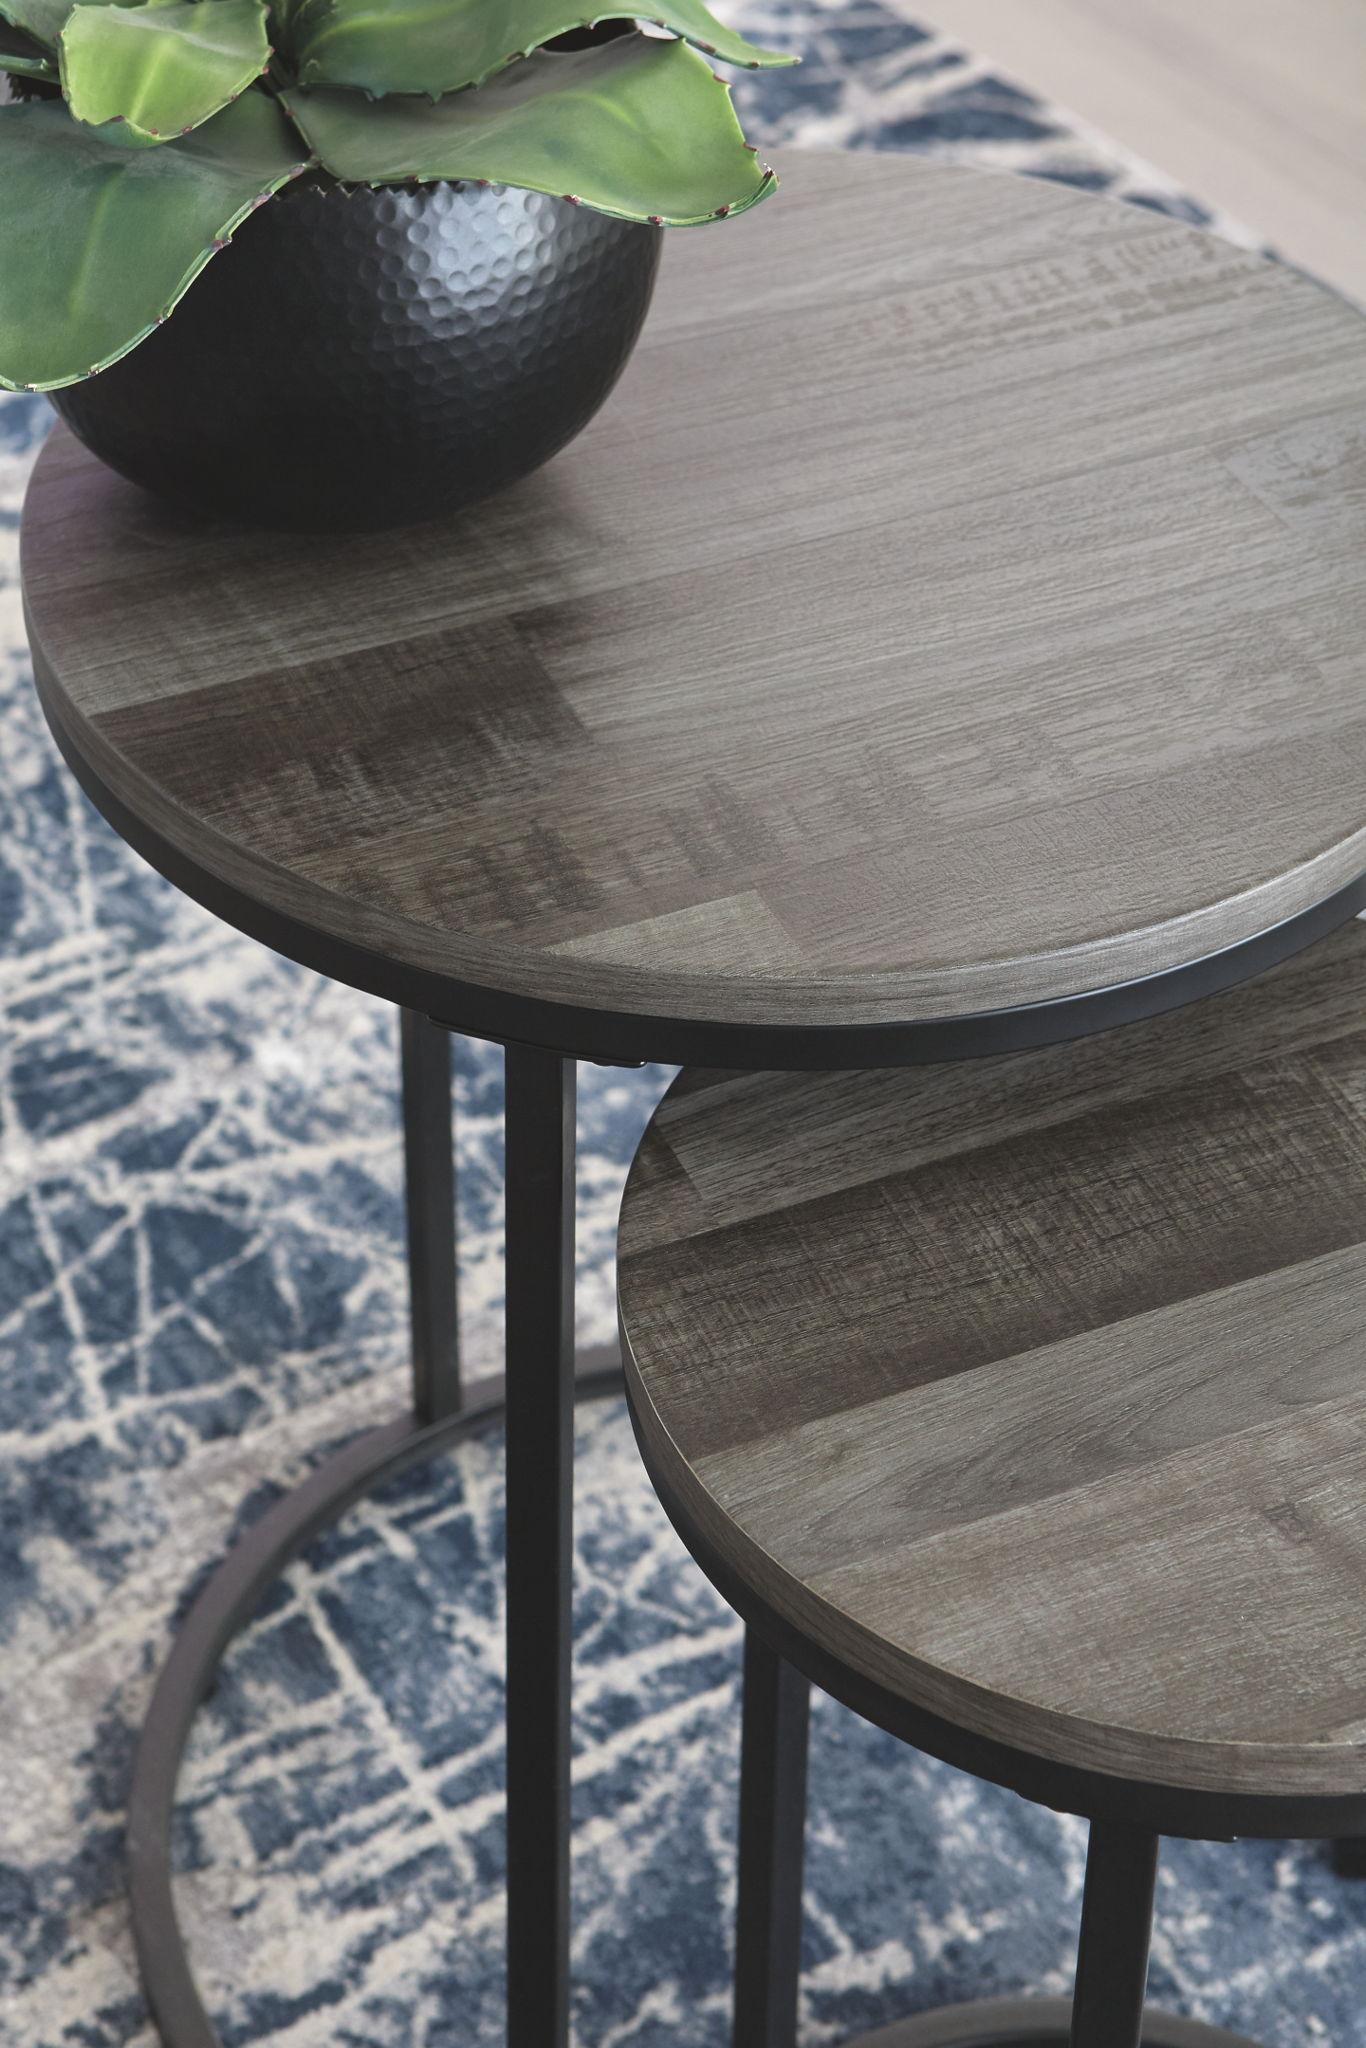 - Briarsboro - Black/Gray - Accent Table Set Furniture Warehouse Ohio